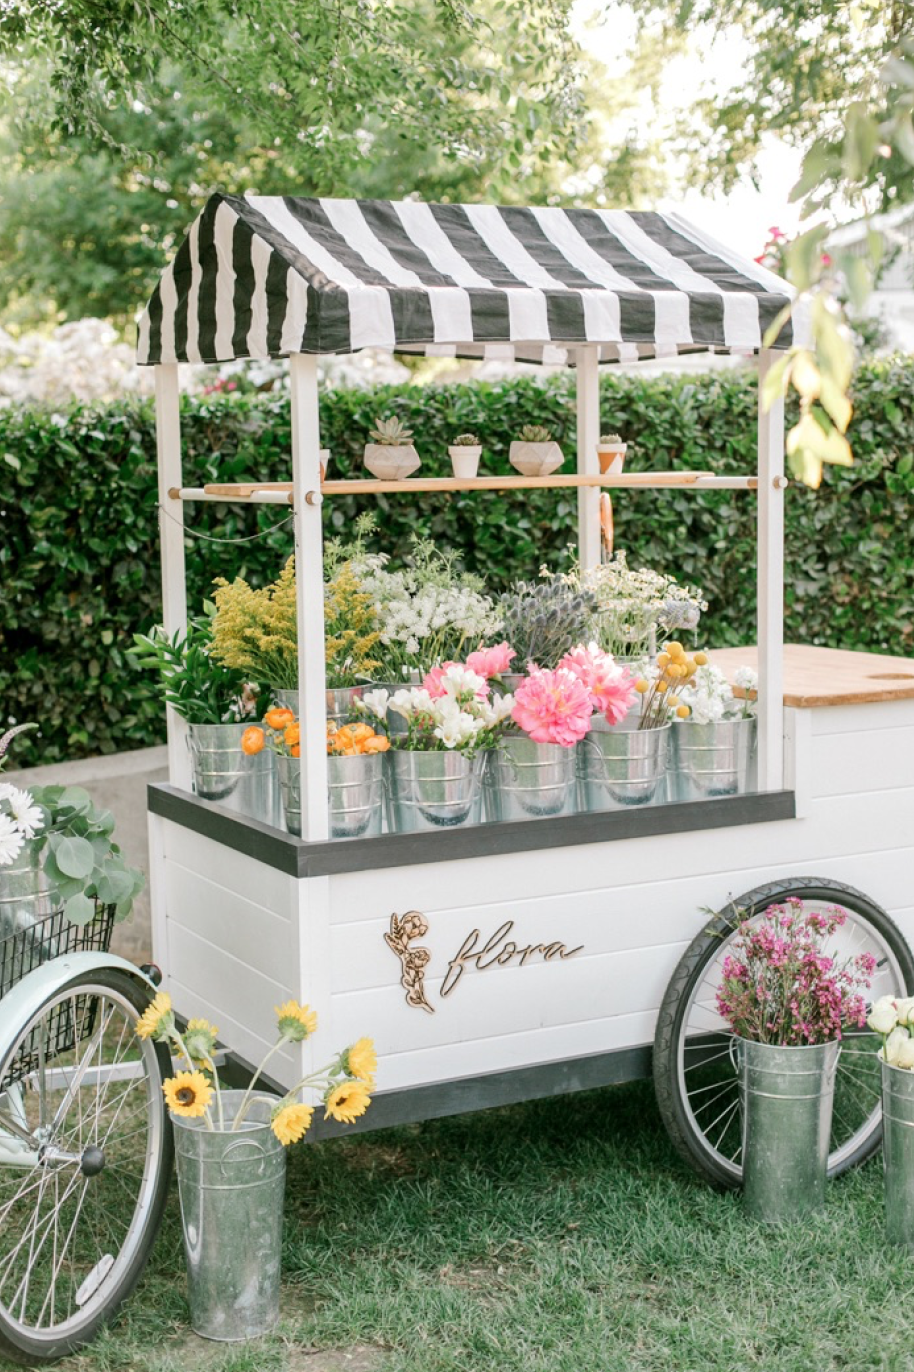 Follow floraflowercart on Instagram! Flower truck